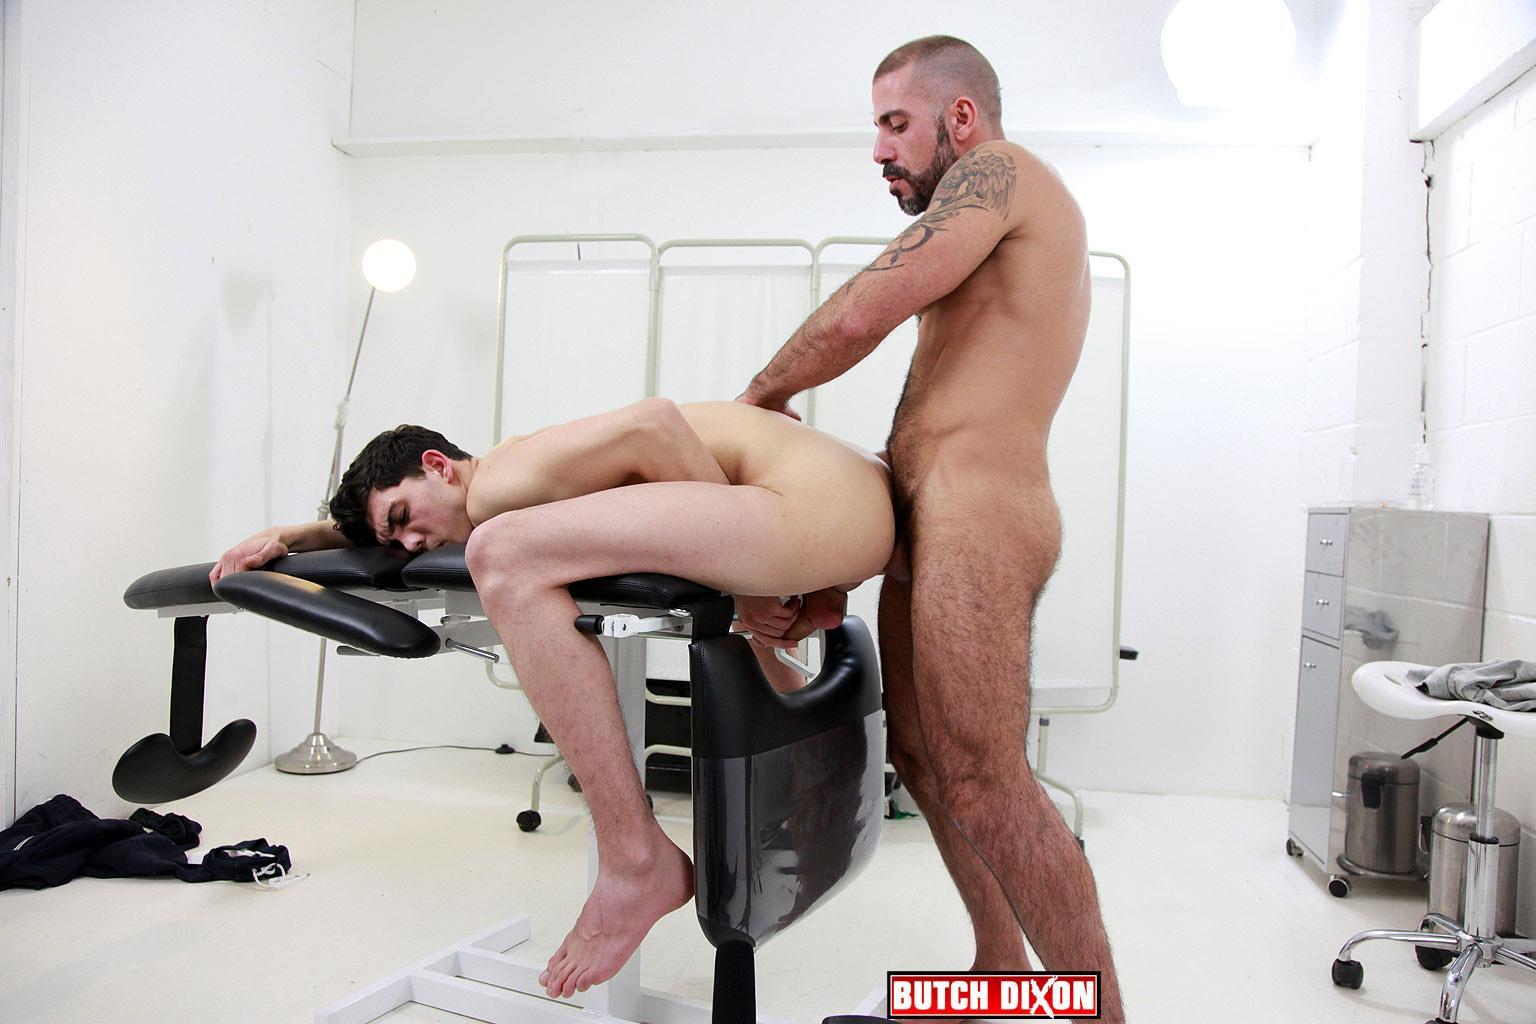 Butch-Dixon-Michel-Rudin-and-Luke-Tyler-Big-Uncut-Cock-Fucking-Amateur-Gay-Porn-21 Hairy Muscle Hunk With A Big Uncut Cock Fucking A Smooth Younger Guy